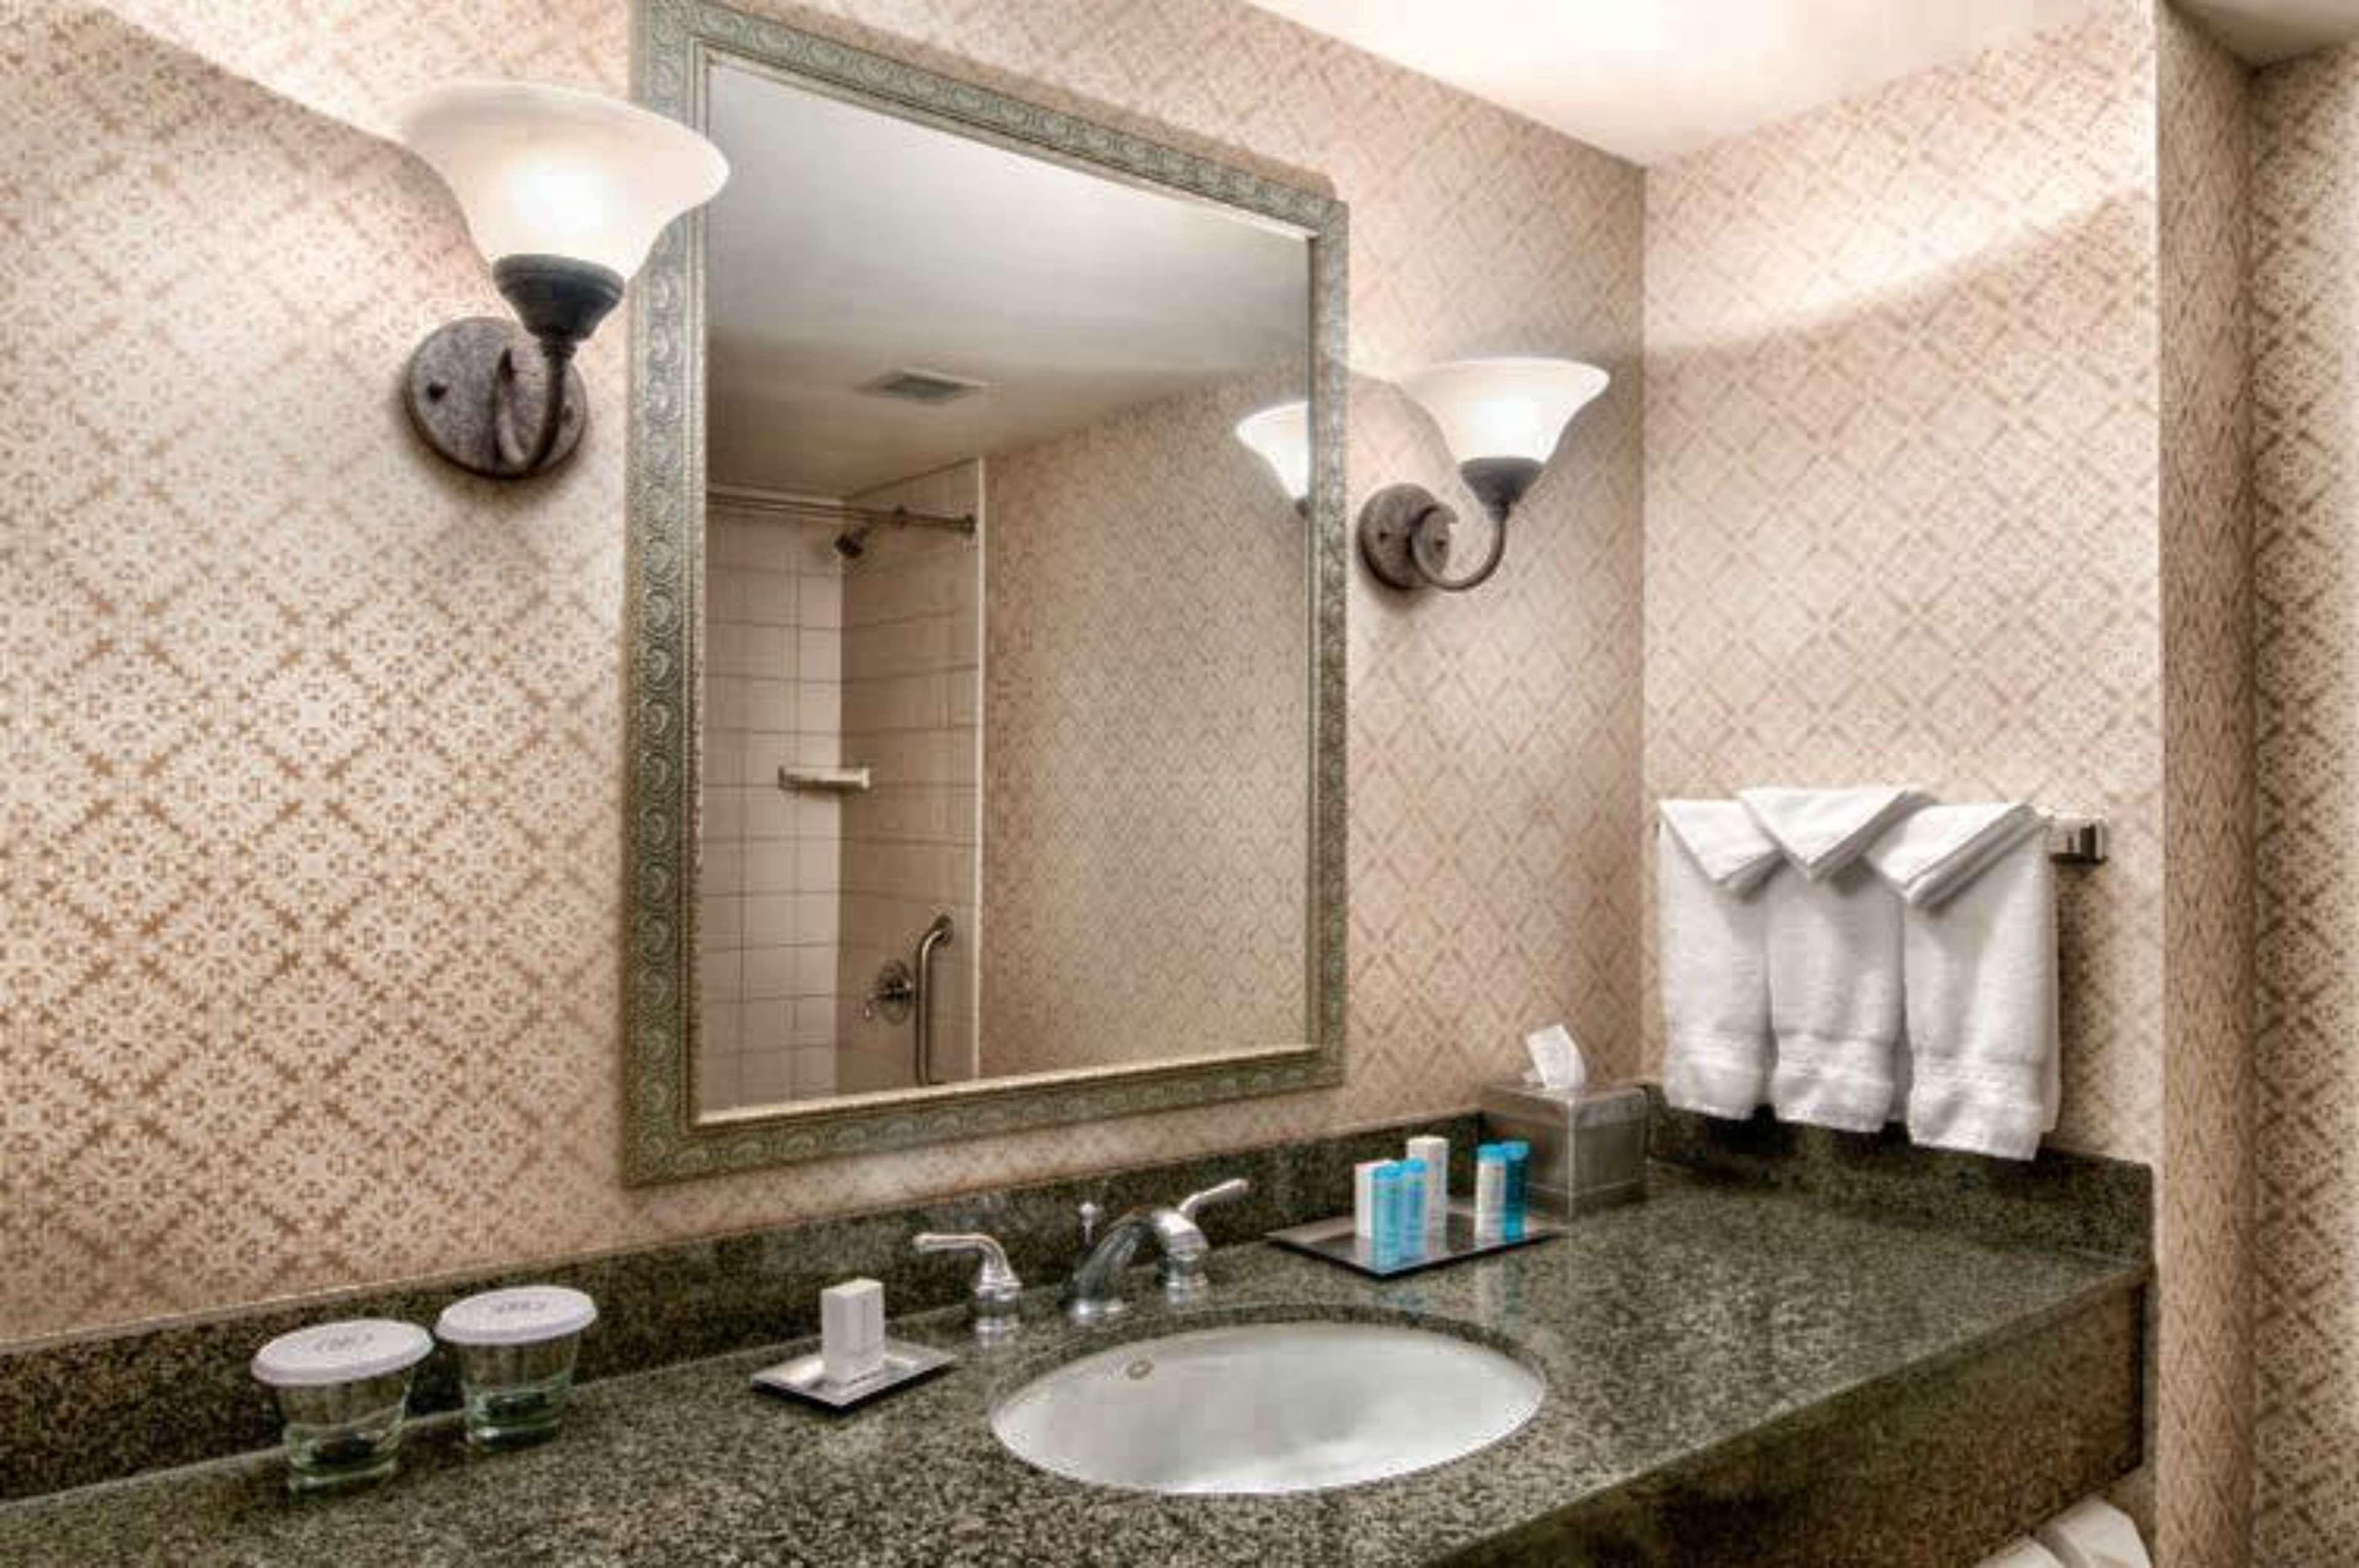 Hilton Scranton & Conference Center image 22